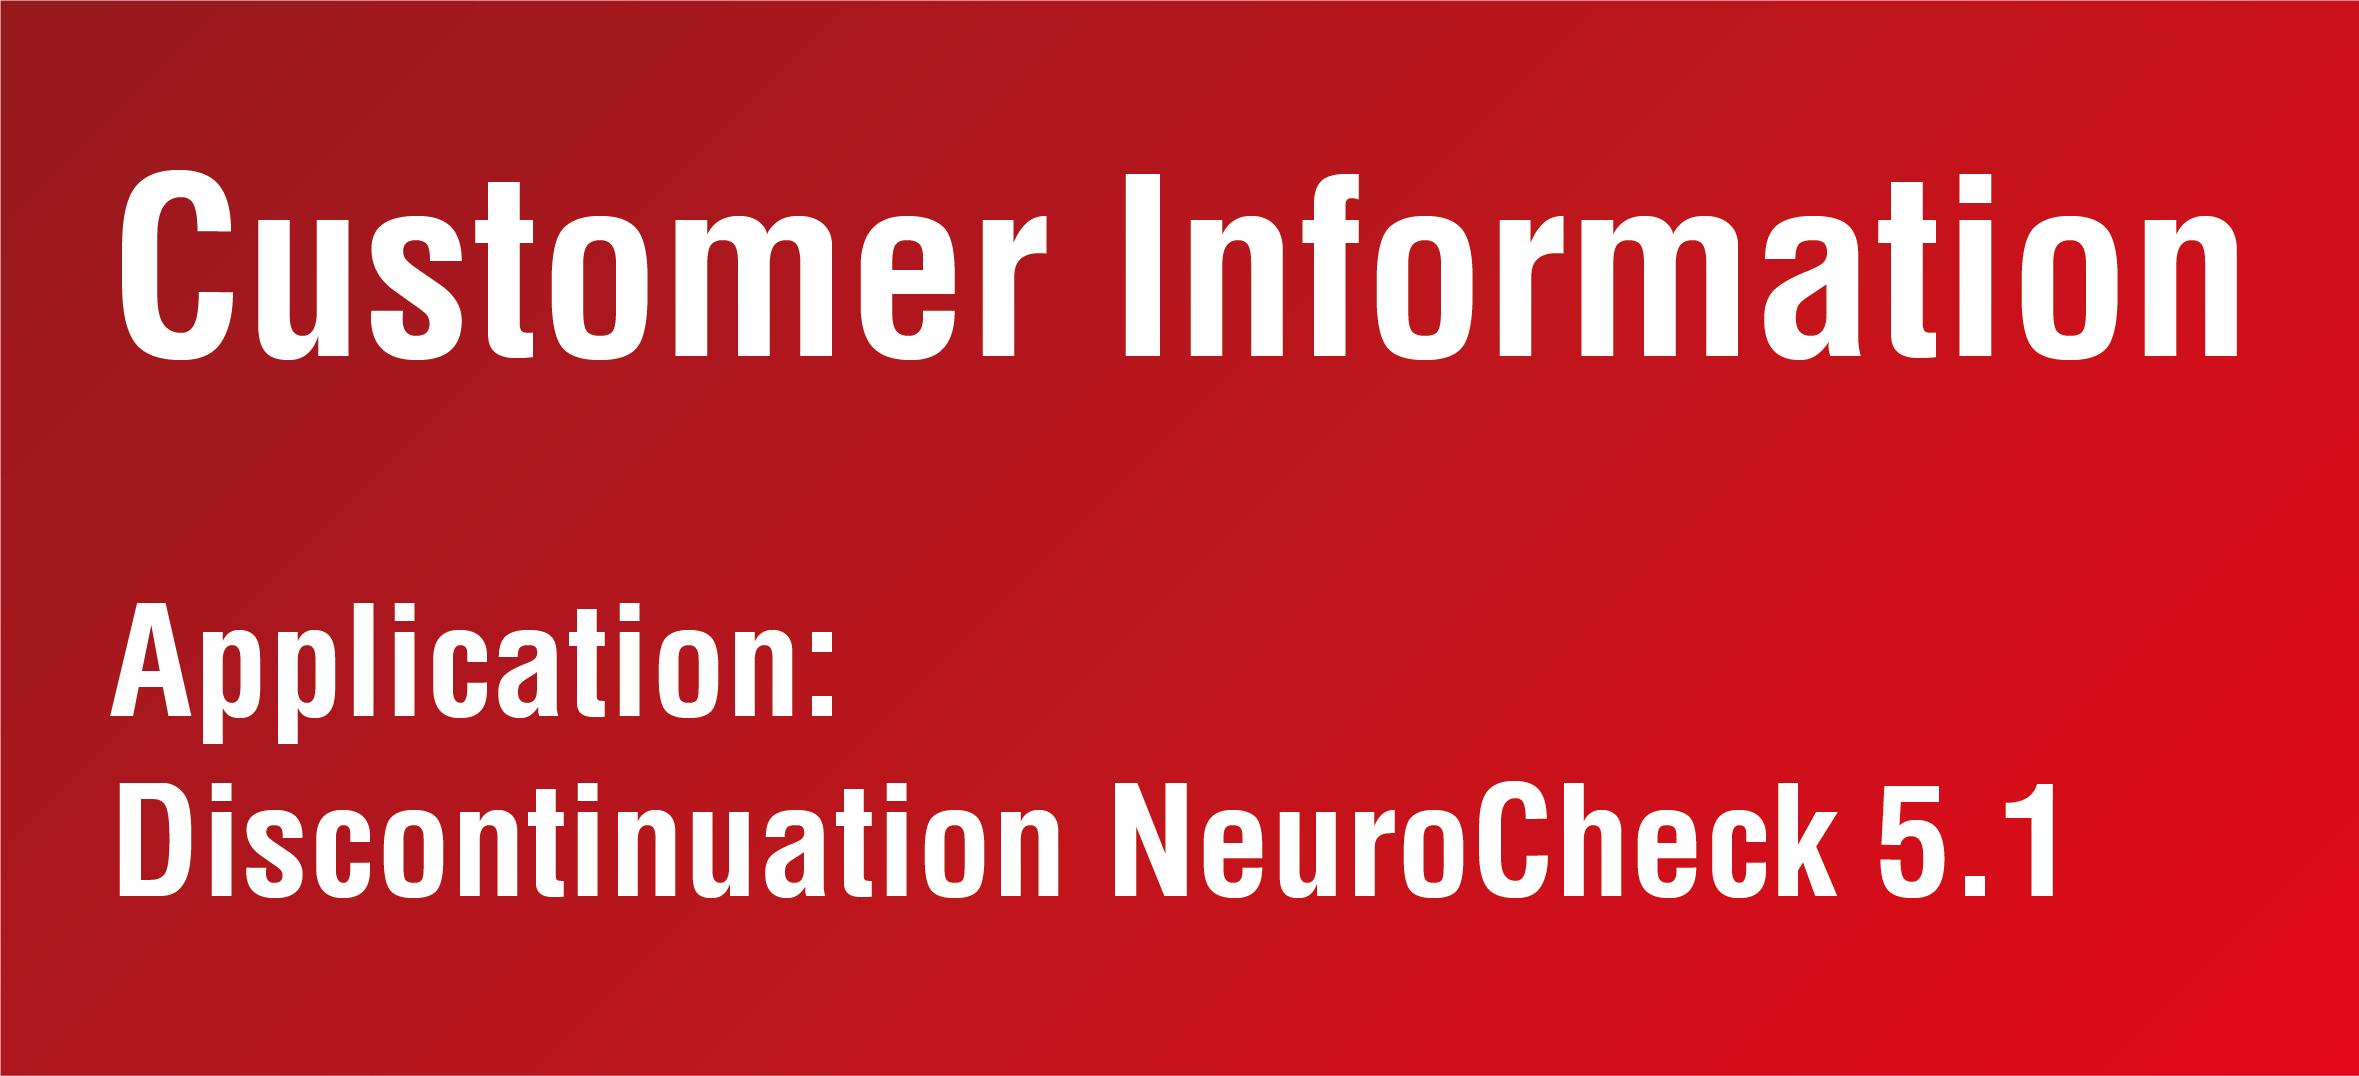 NeuroCheck Customer Information - Discontinuation NeuroCheck 5.1 (Image © NeuroCheck)